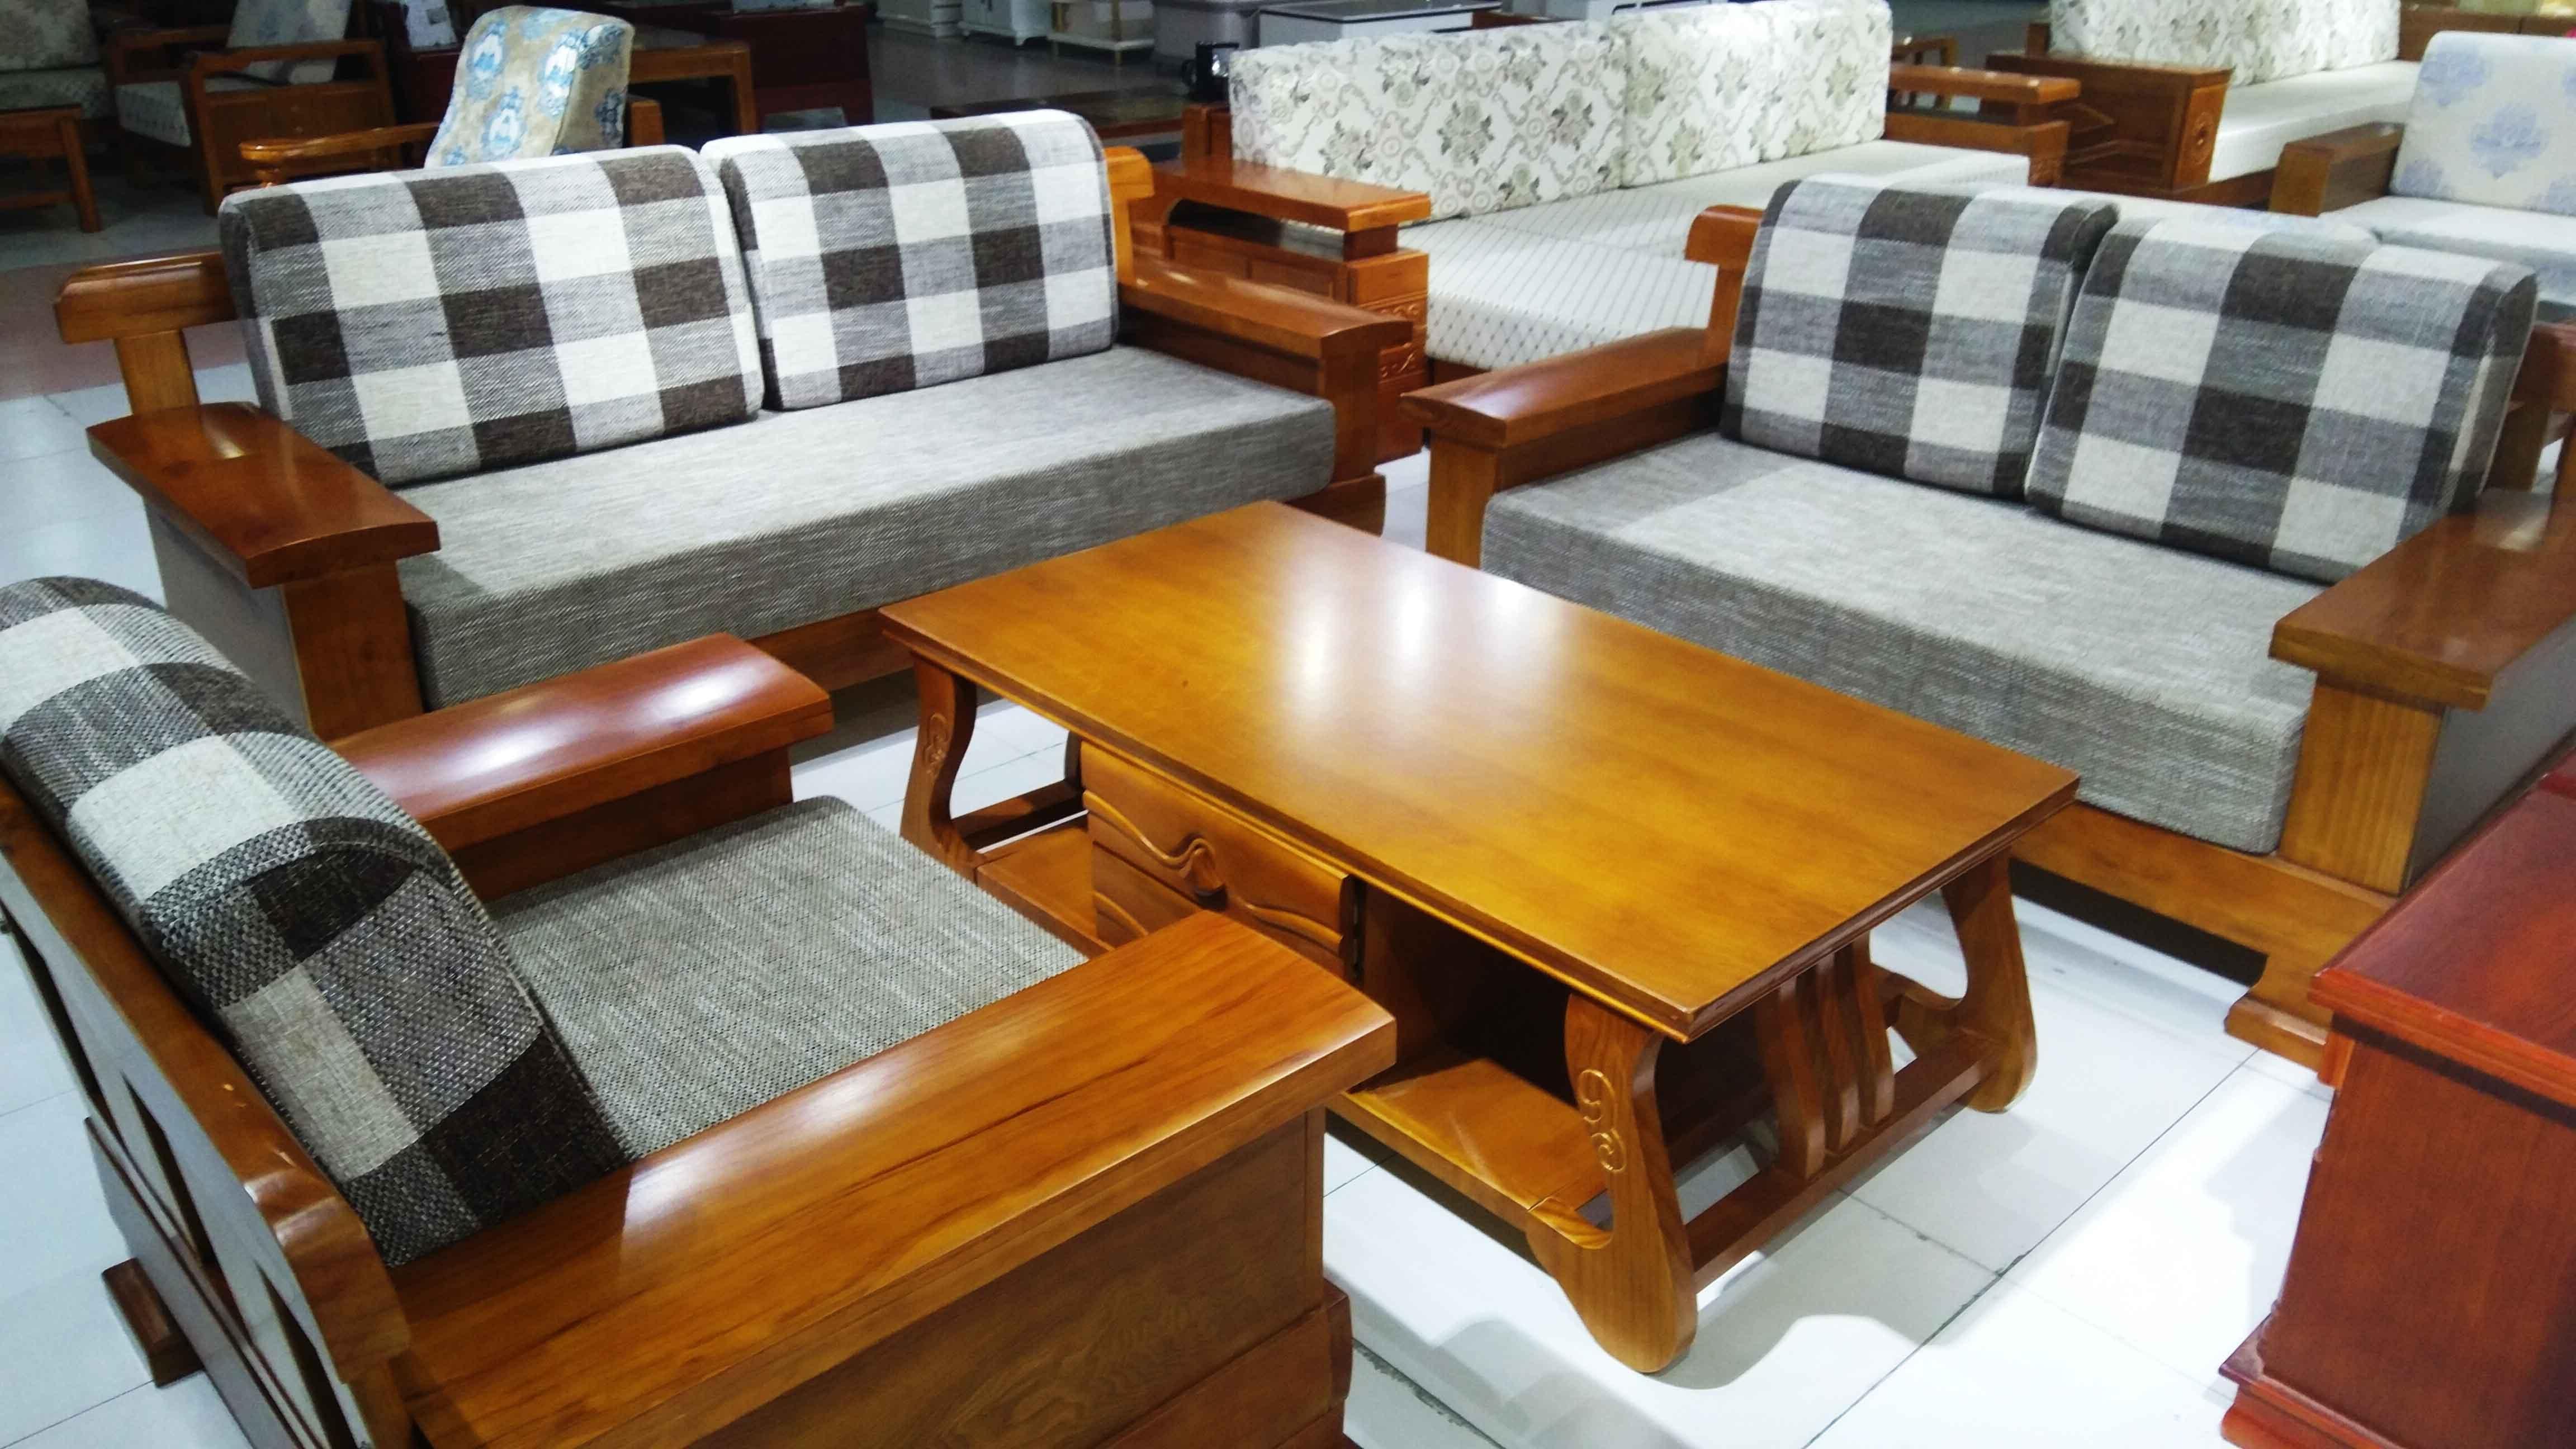 实木橡木松木沙发